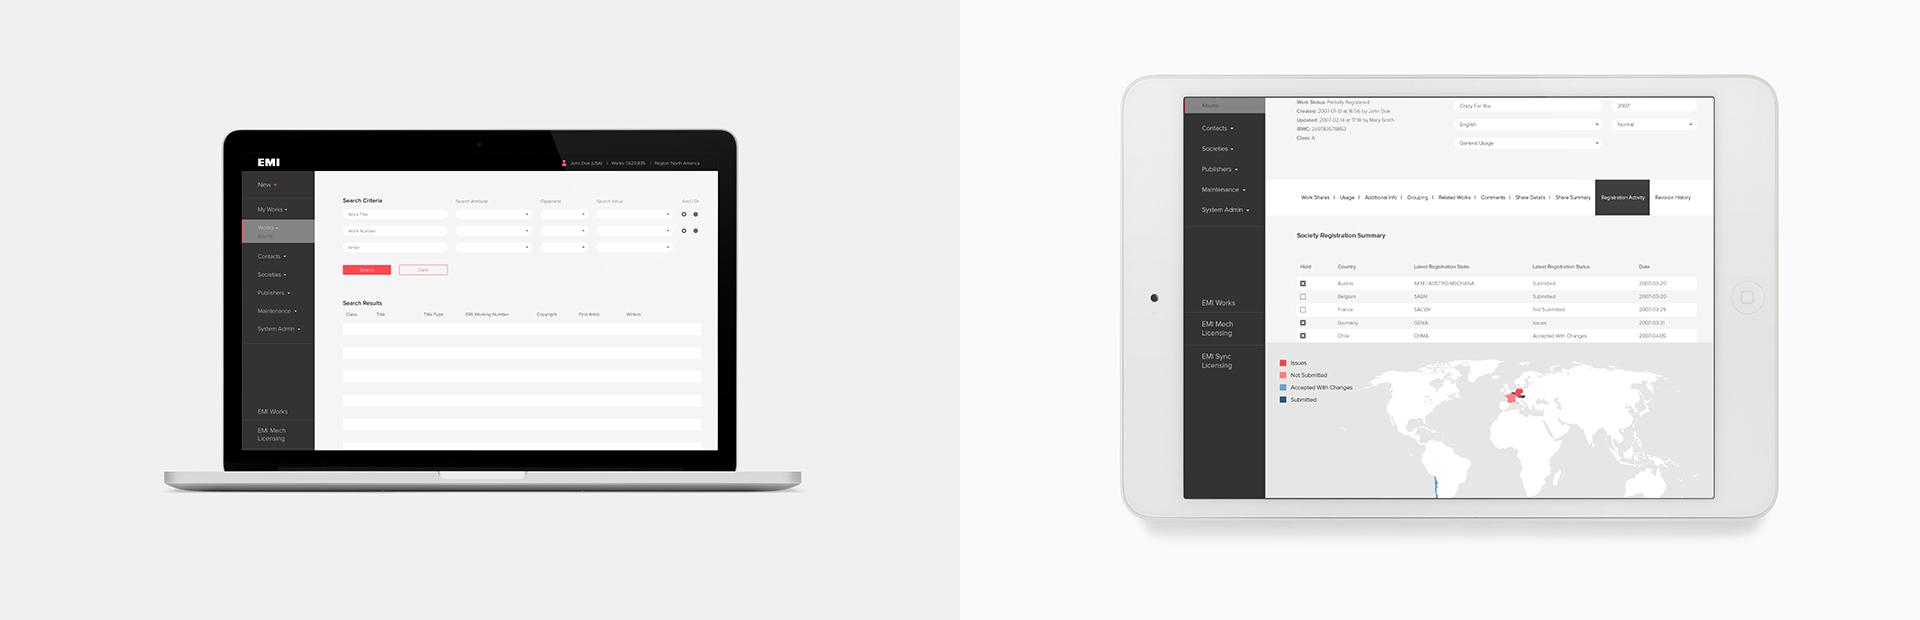 bluprint-case-studies-emi-laptop-ipad.jpg